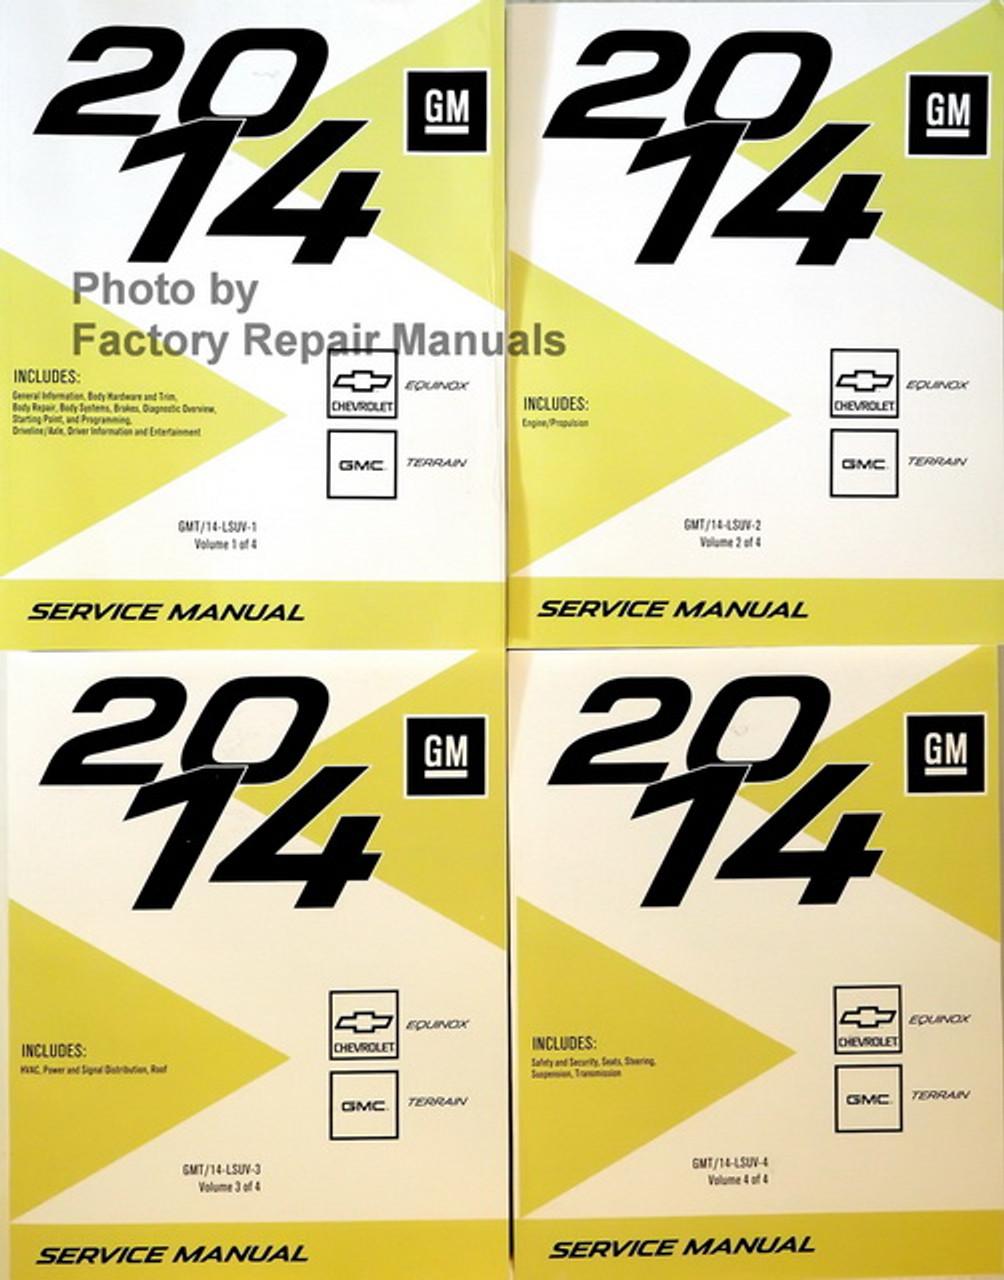 2014 Chevy Equinox Gmc Terrain Factory Service Manual Set Original Shop Repair